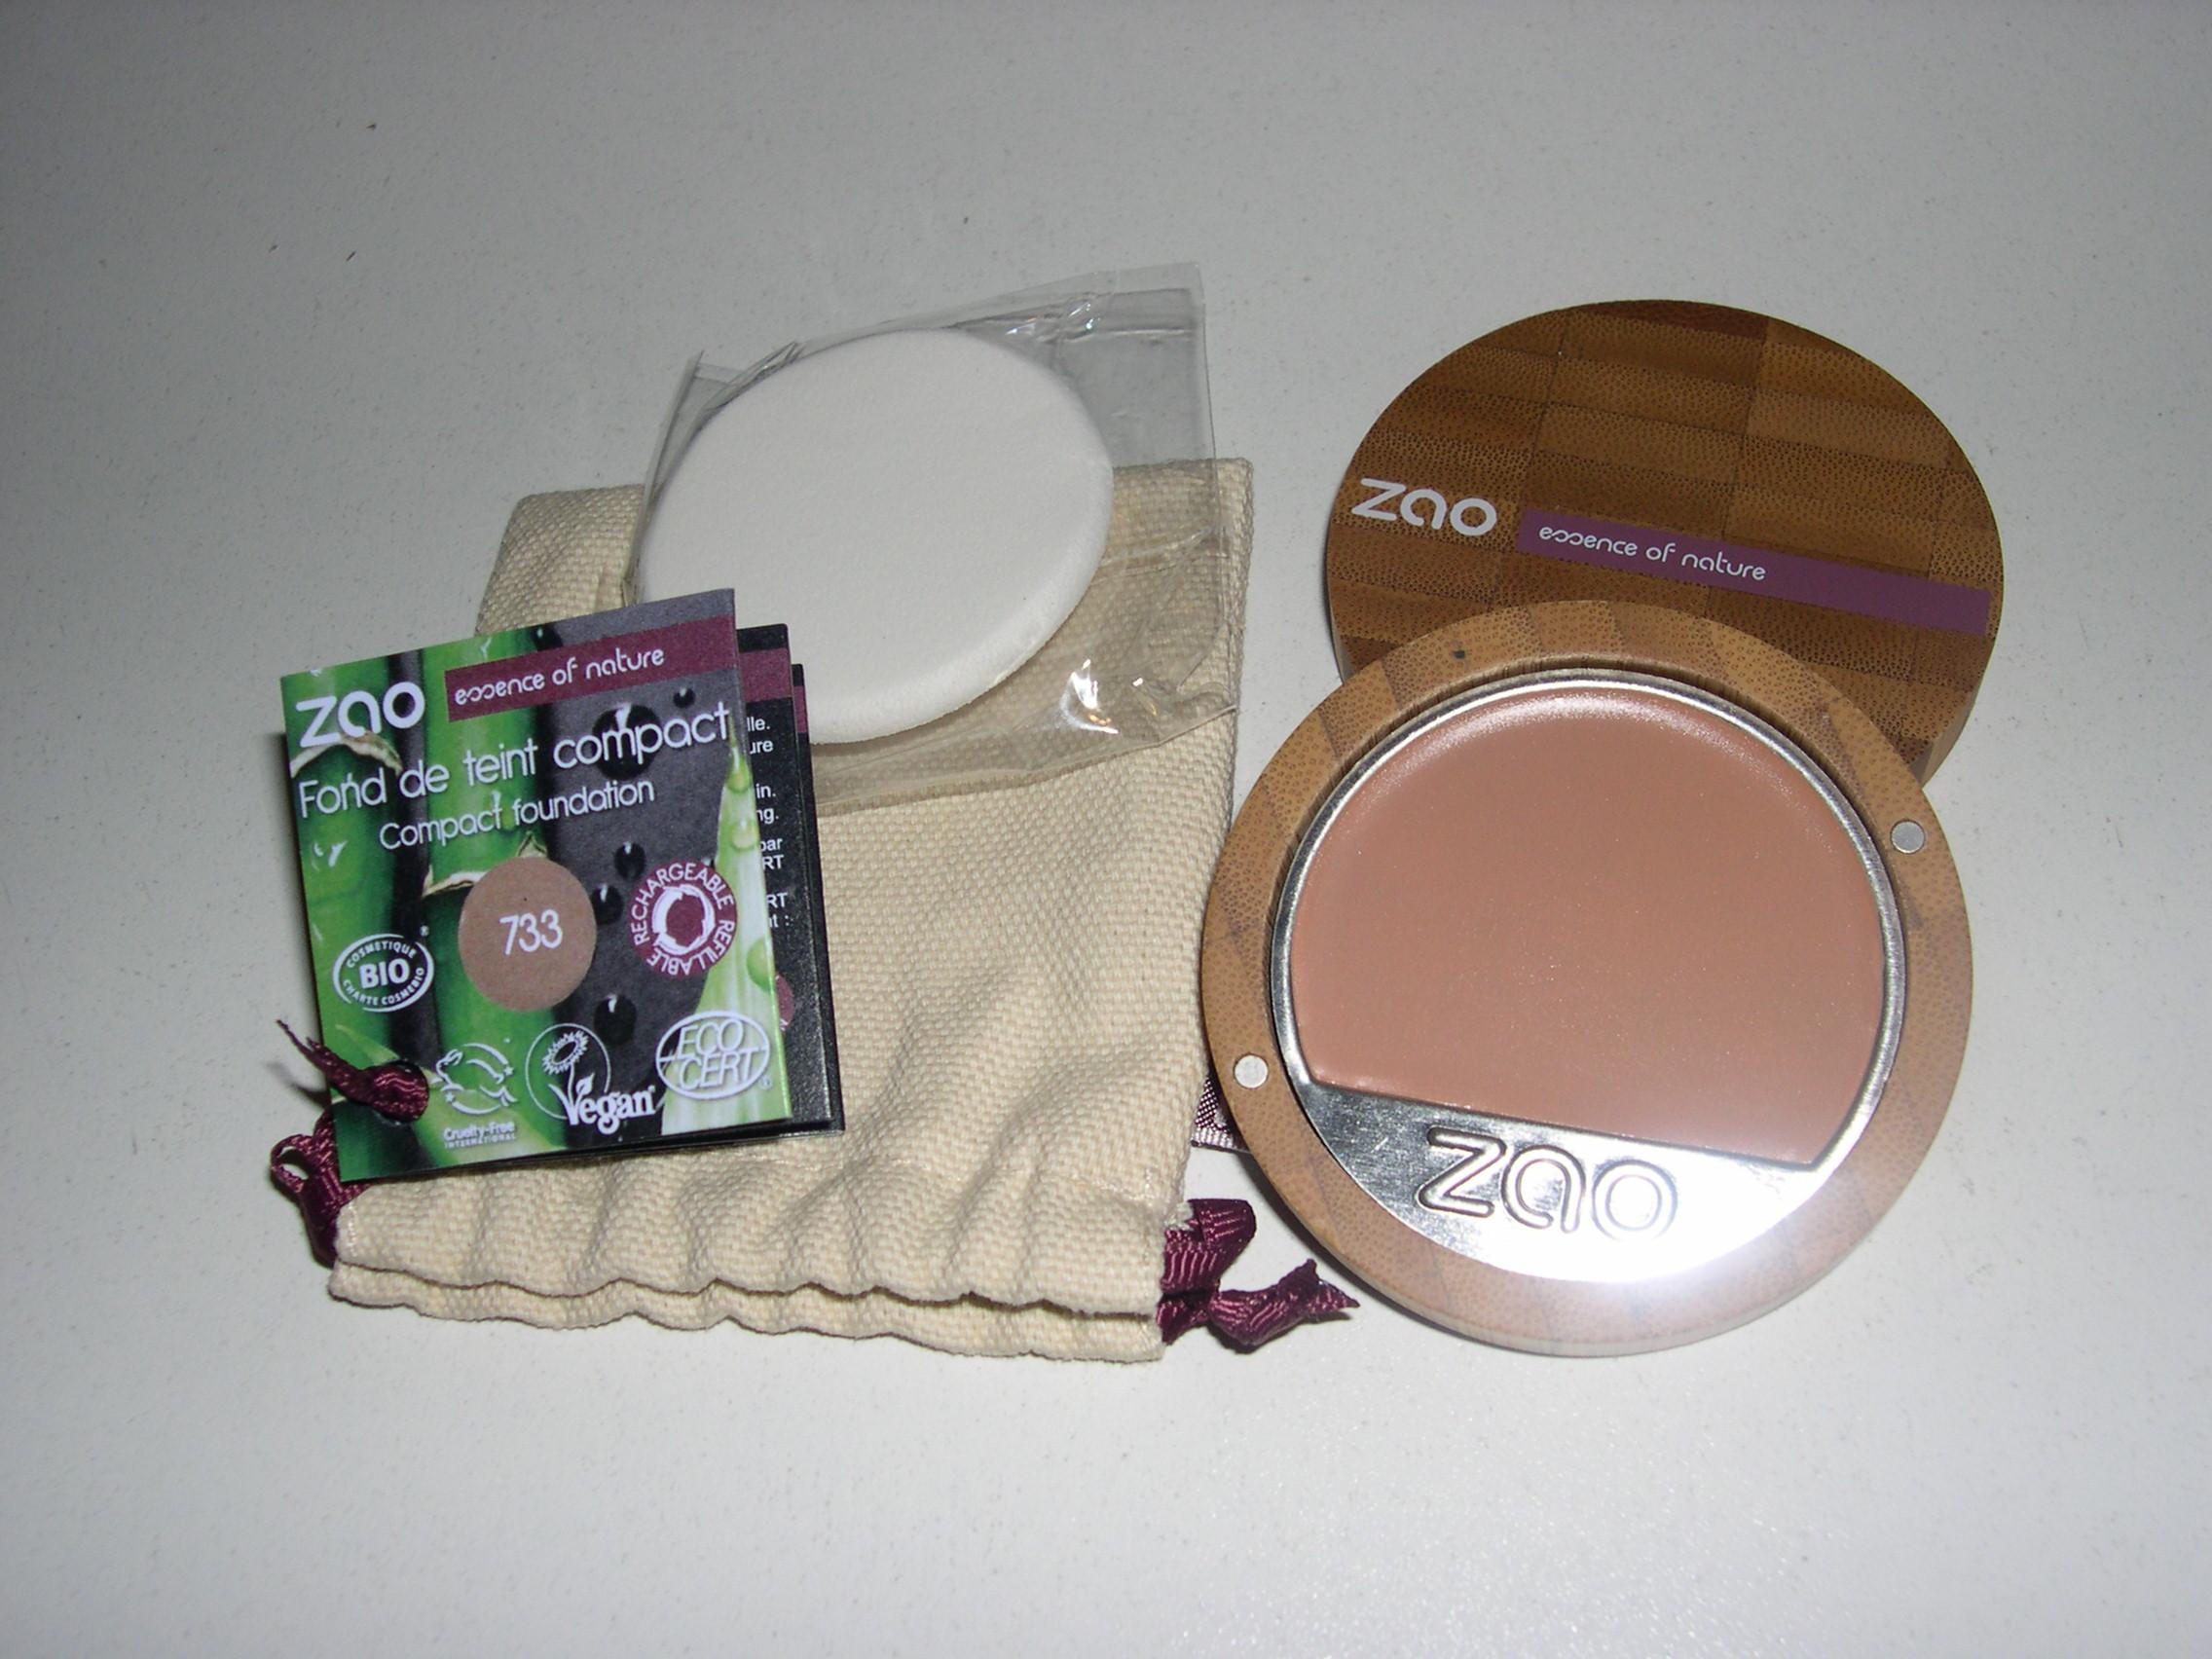 maquillage fond de teint compact neutre 733. Black Bedroom Furniture Sets. Home Design Ideas